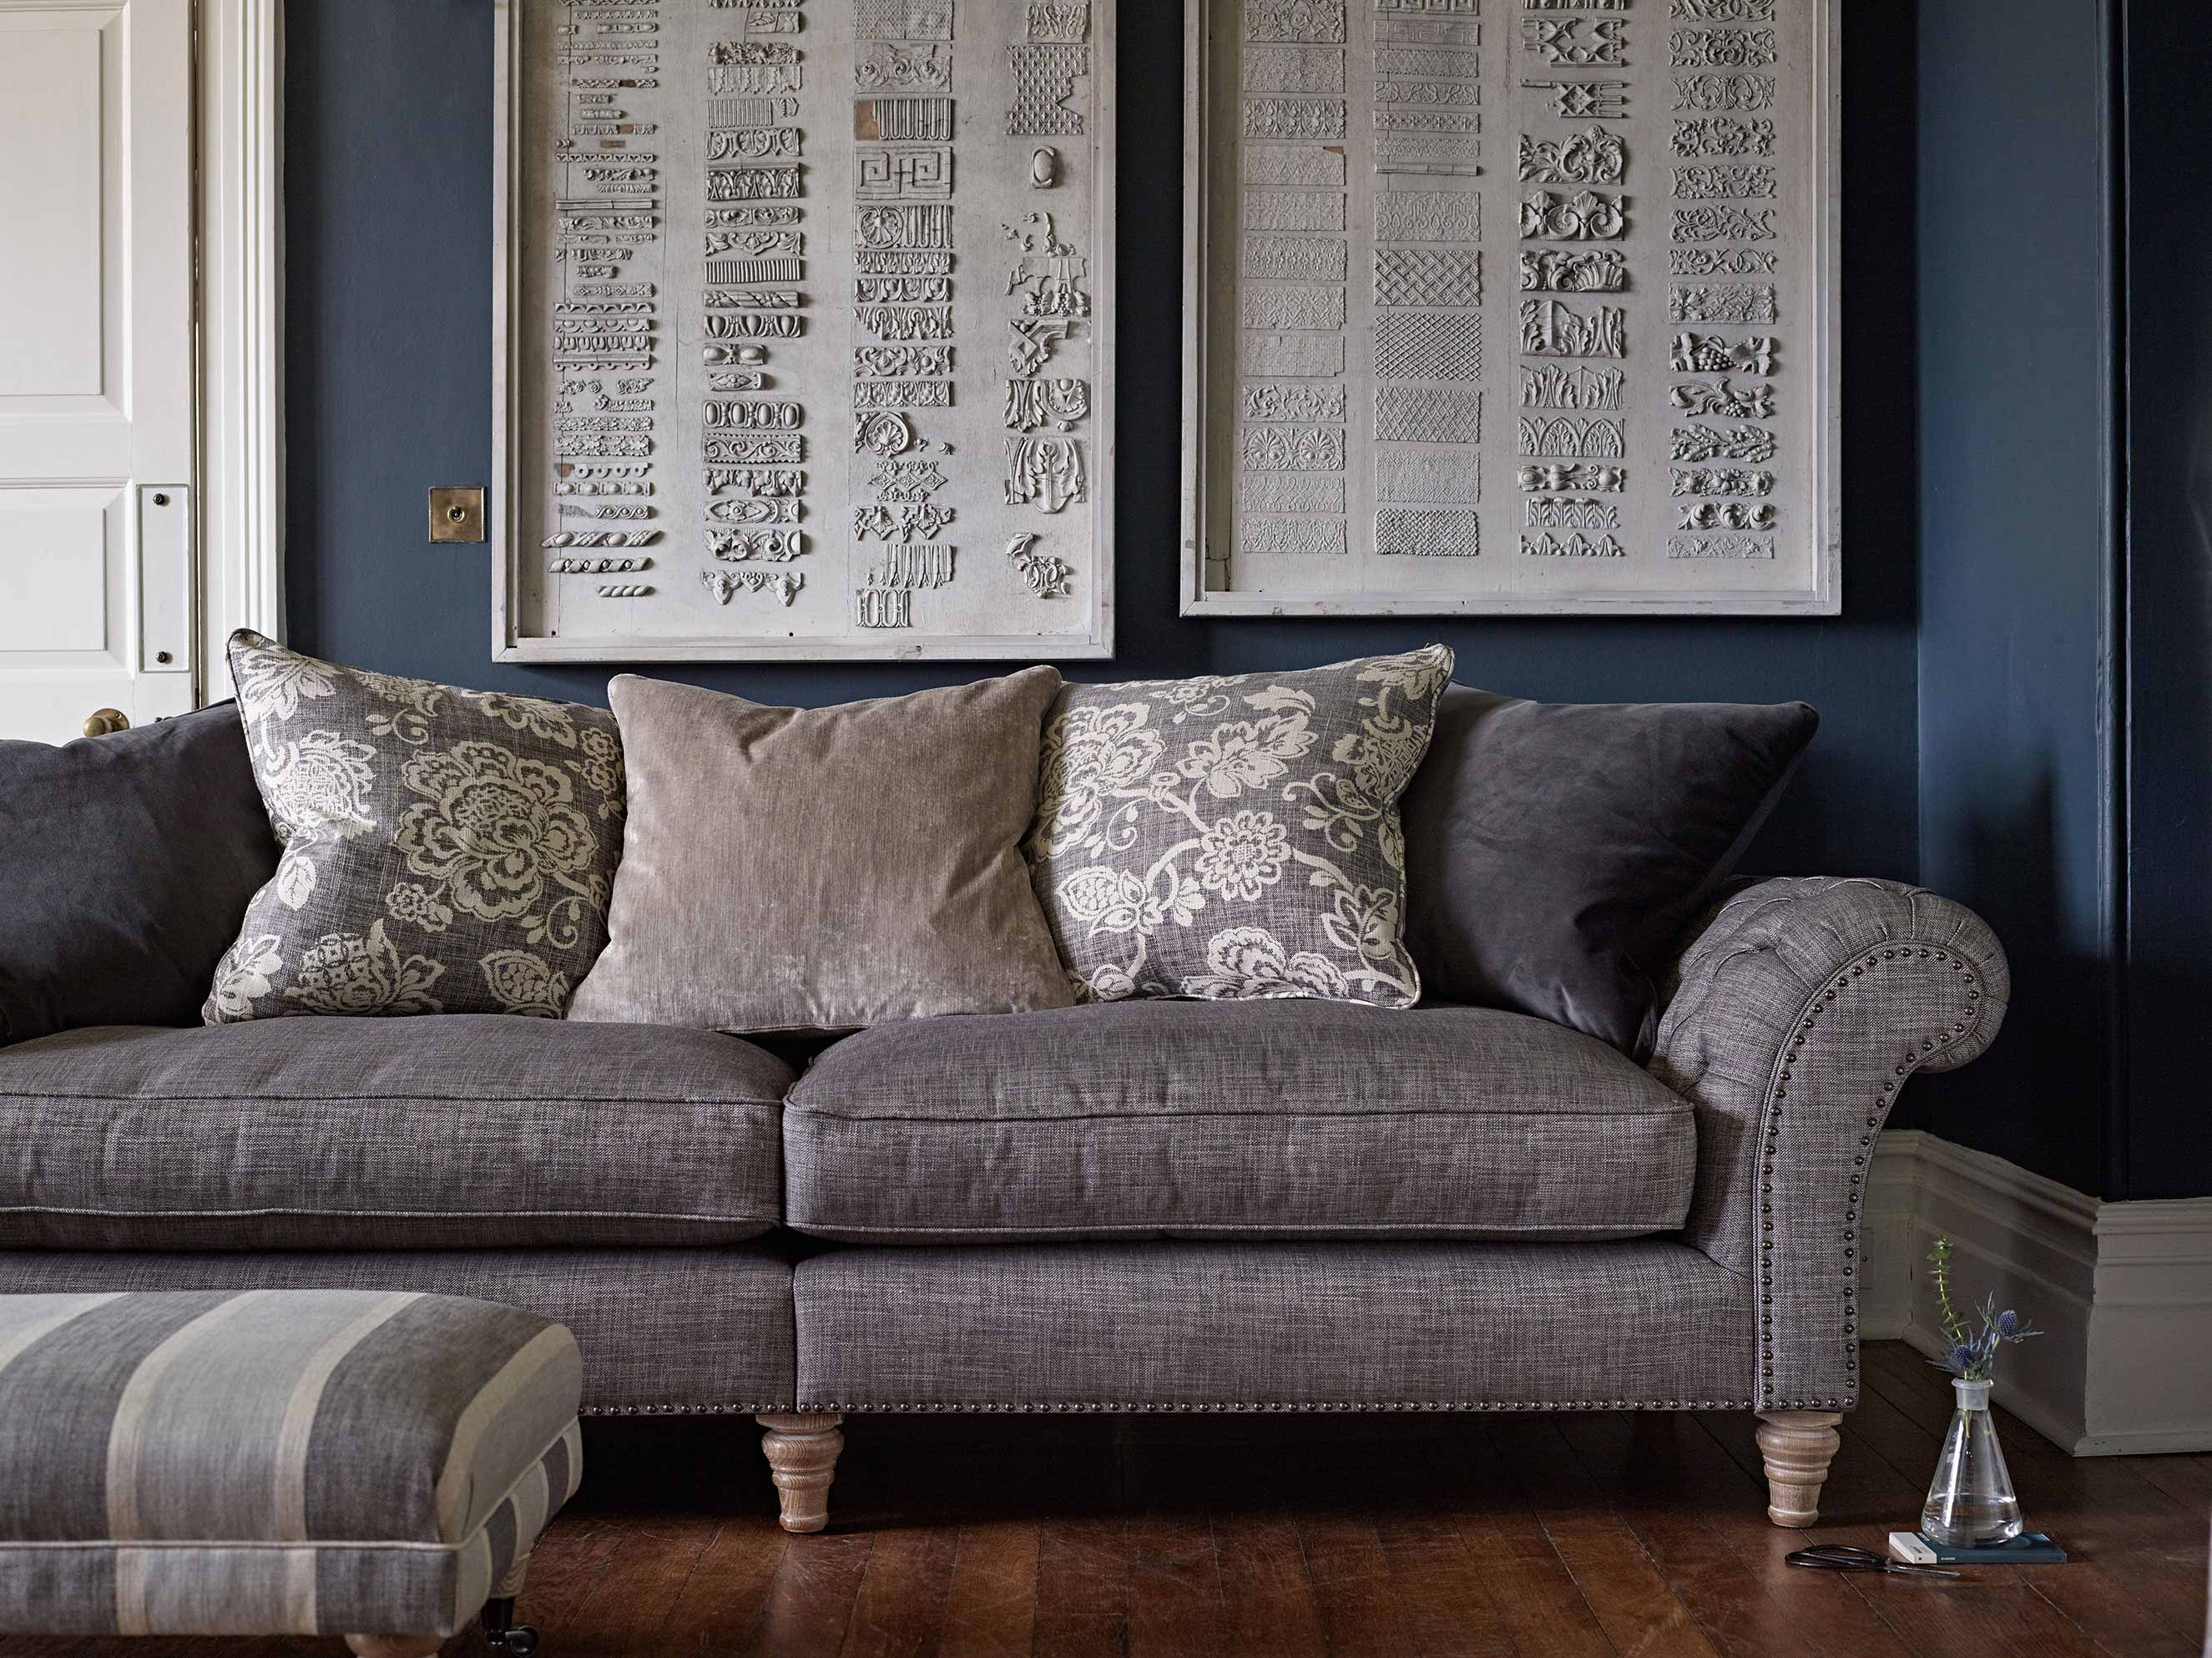 new style of sofa set slipcover india online keaton - westbridge furniture designs